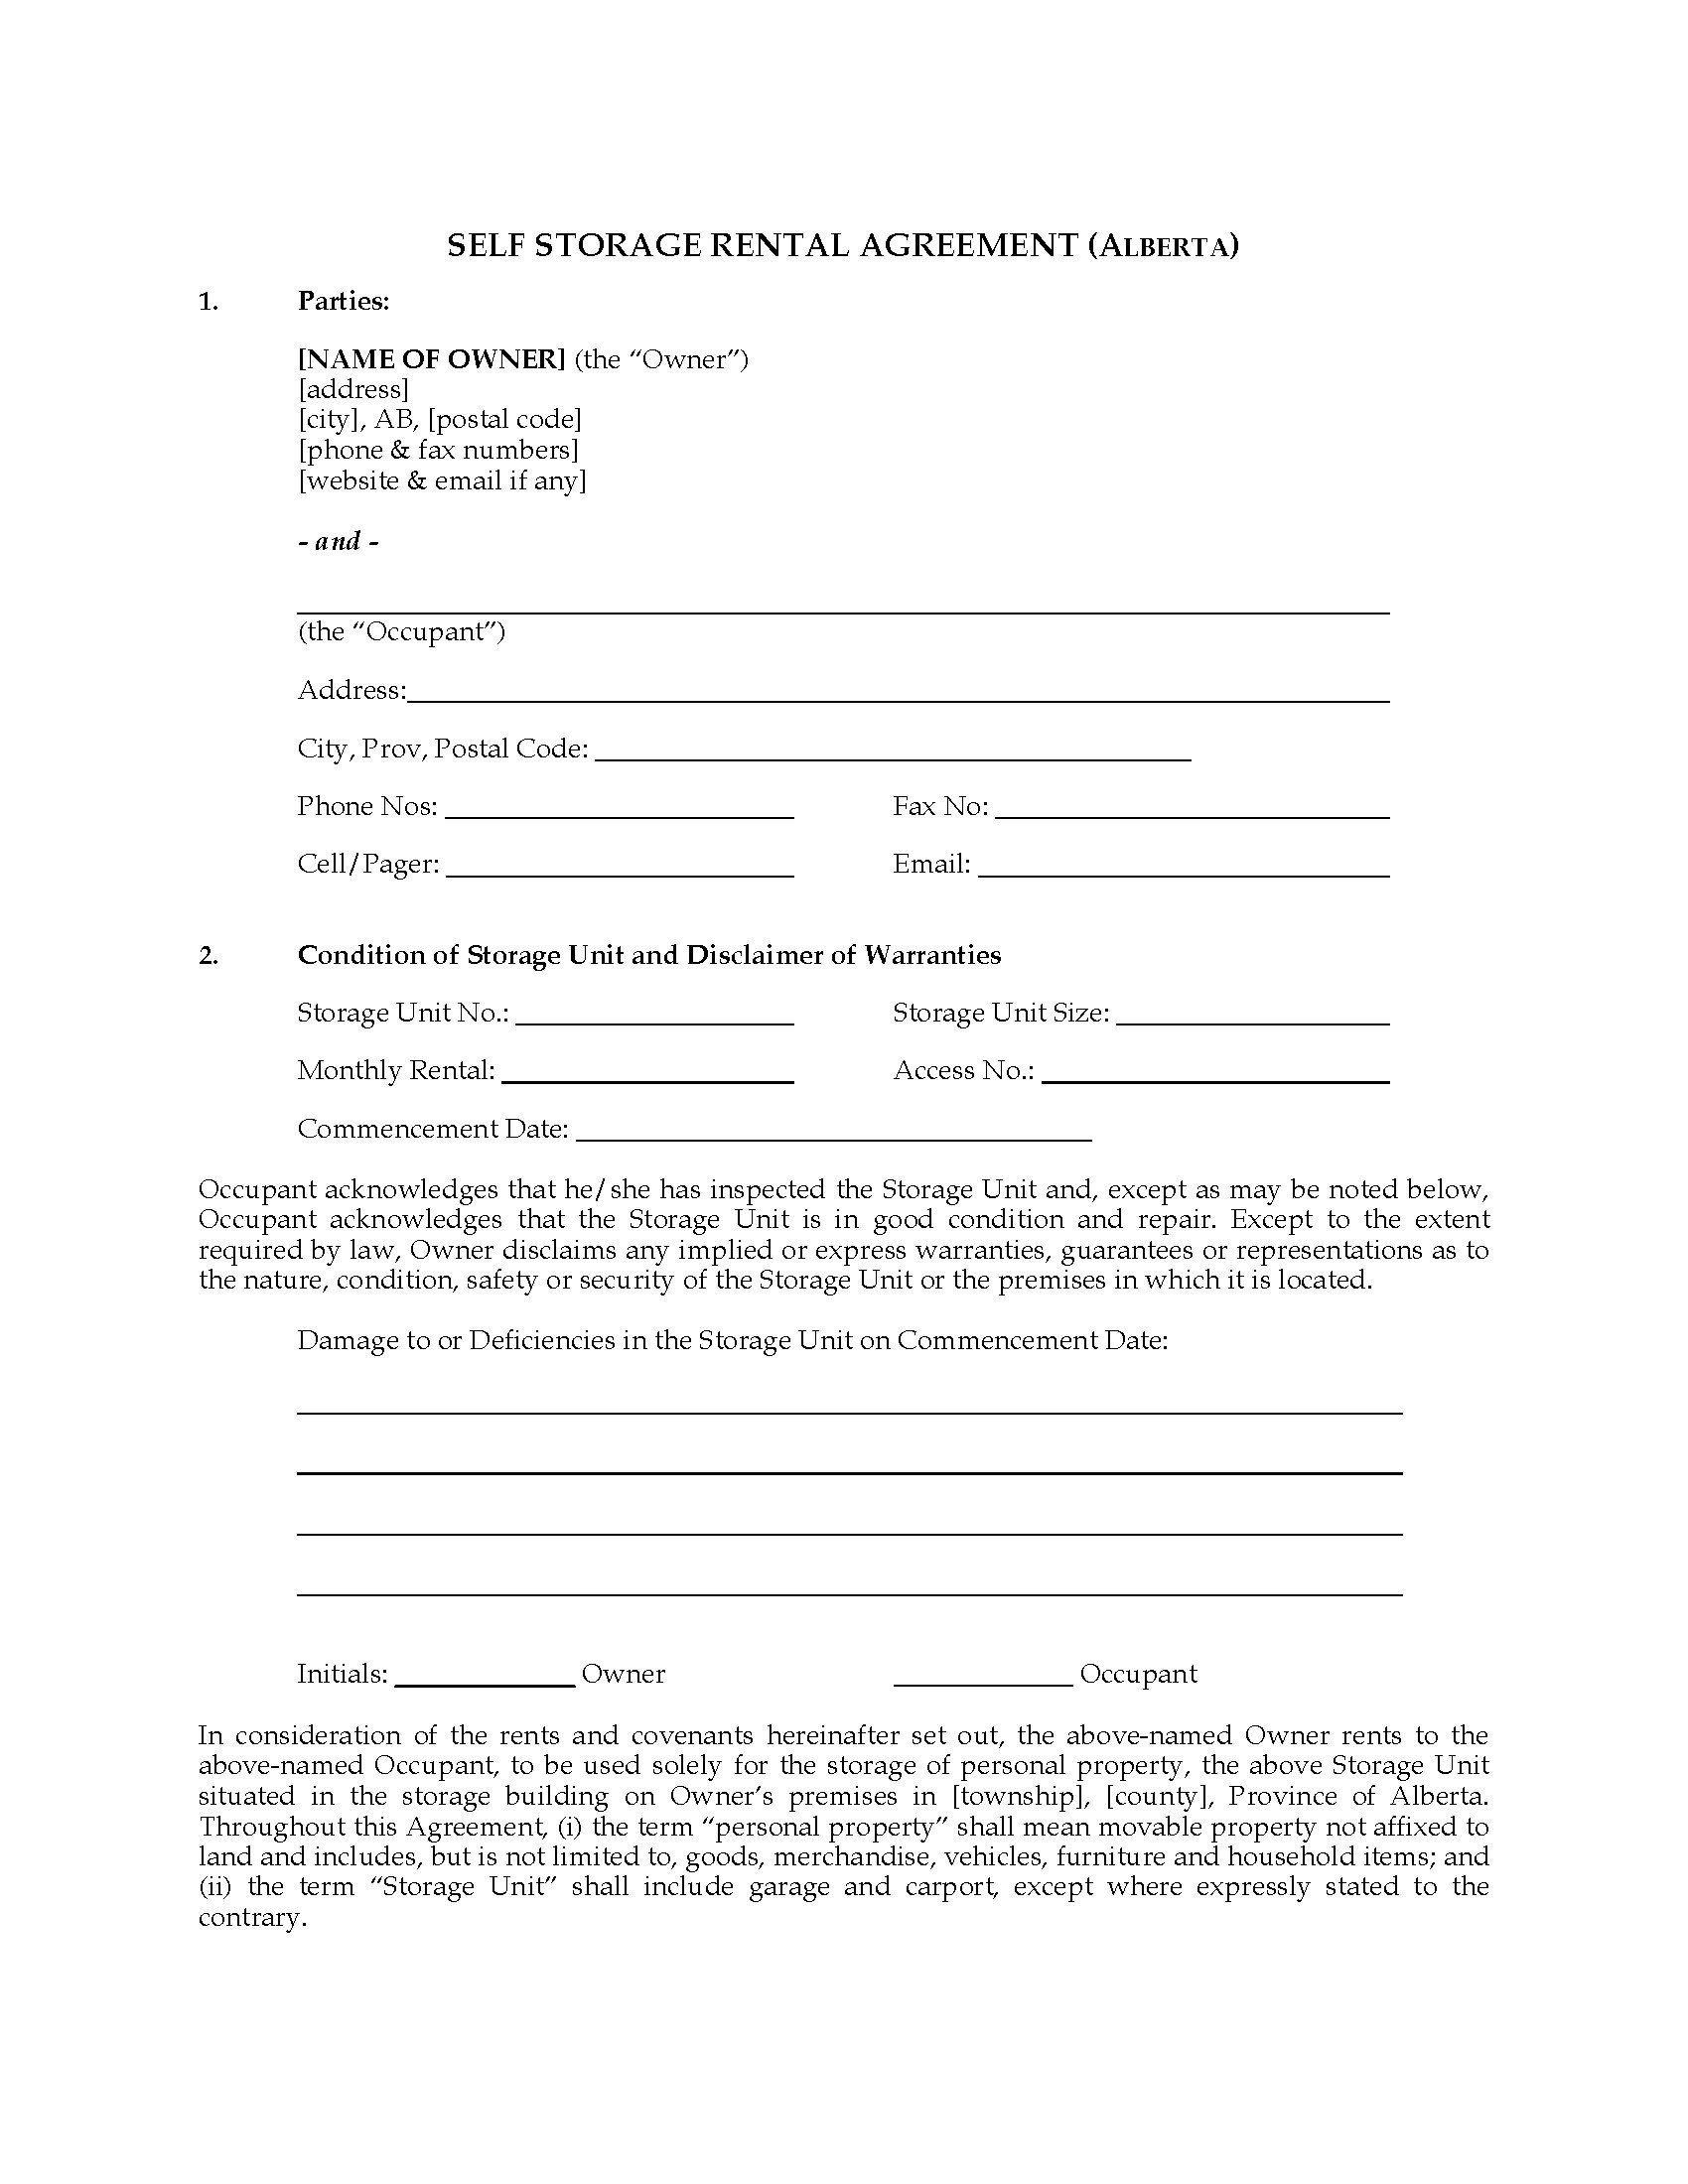 0d663de6fa29f9f010e4d635181d4e48 - How To Get Out Of A Rental Lease Alberta